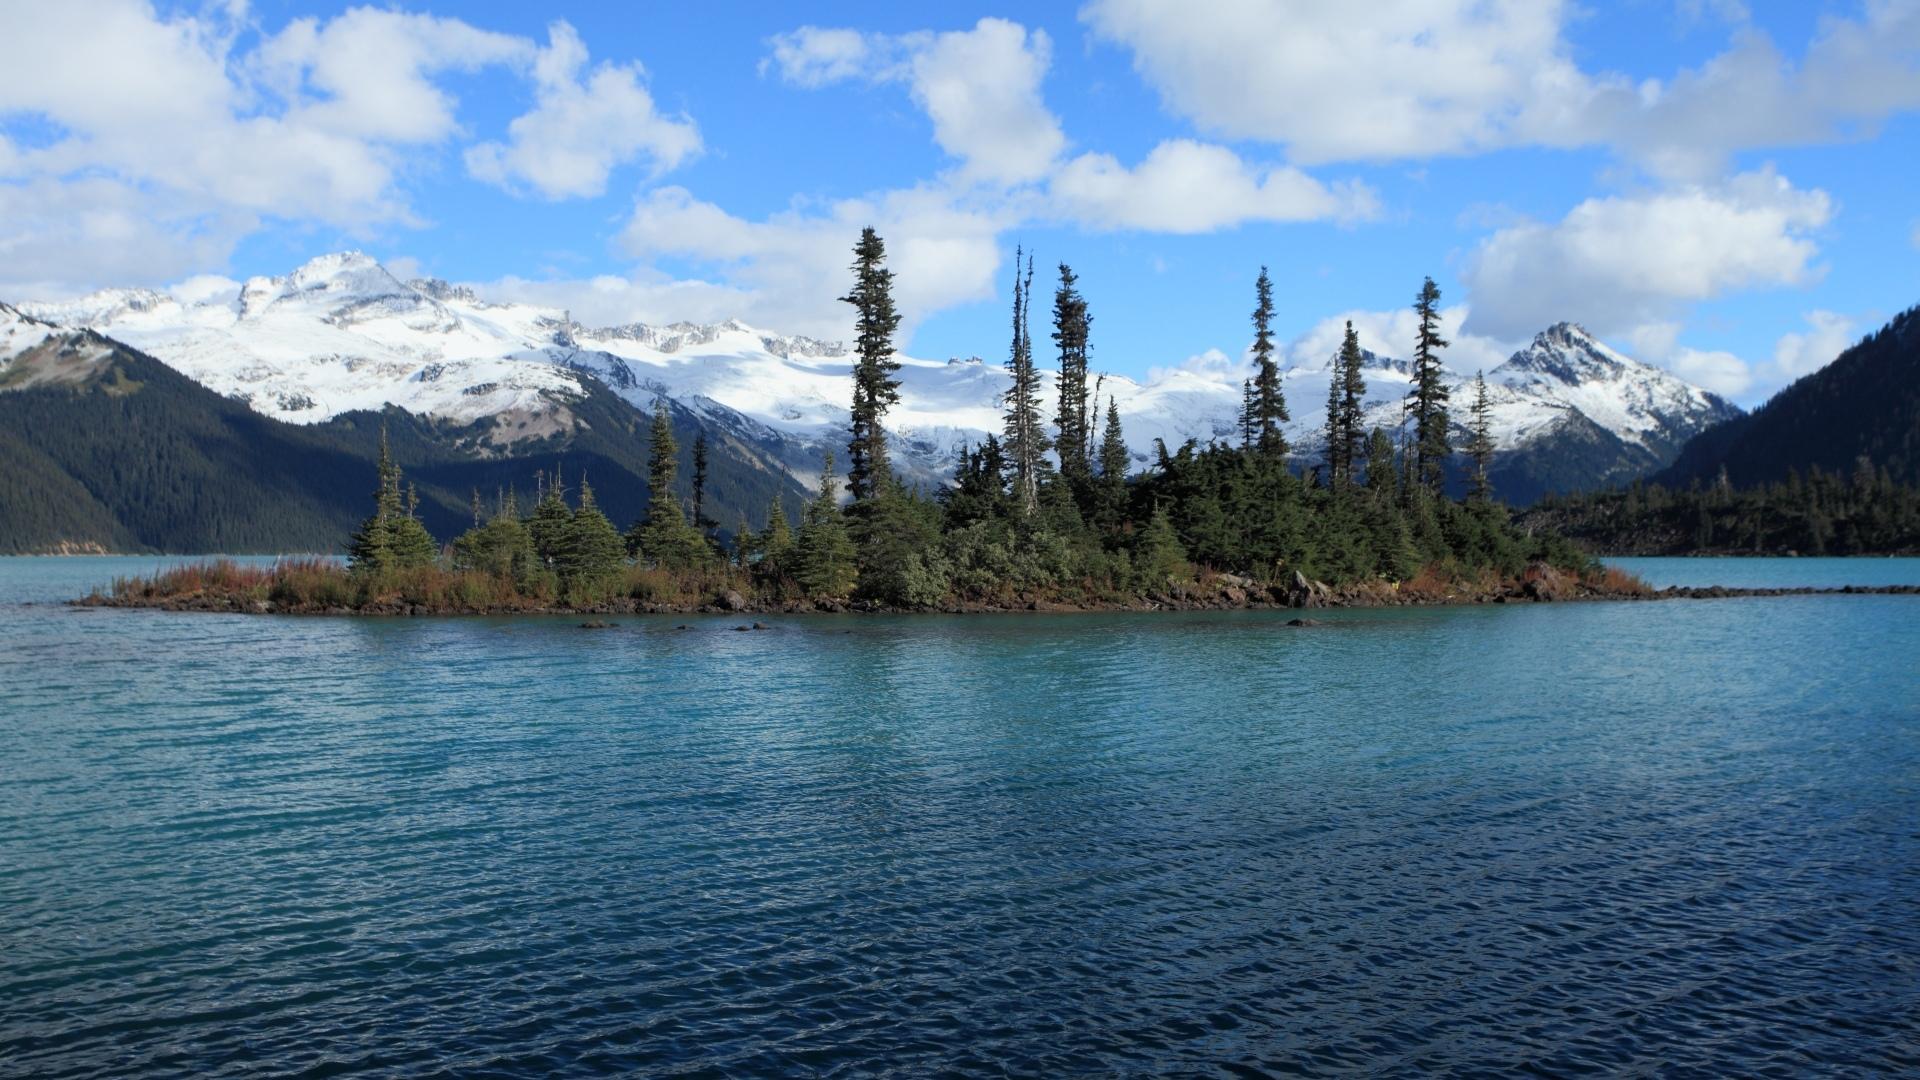 Garibaldi Lake wallpapers HD quality